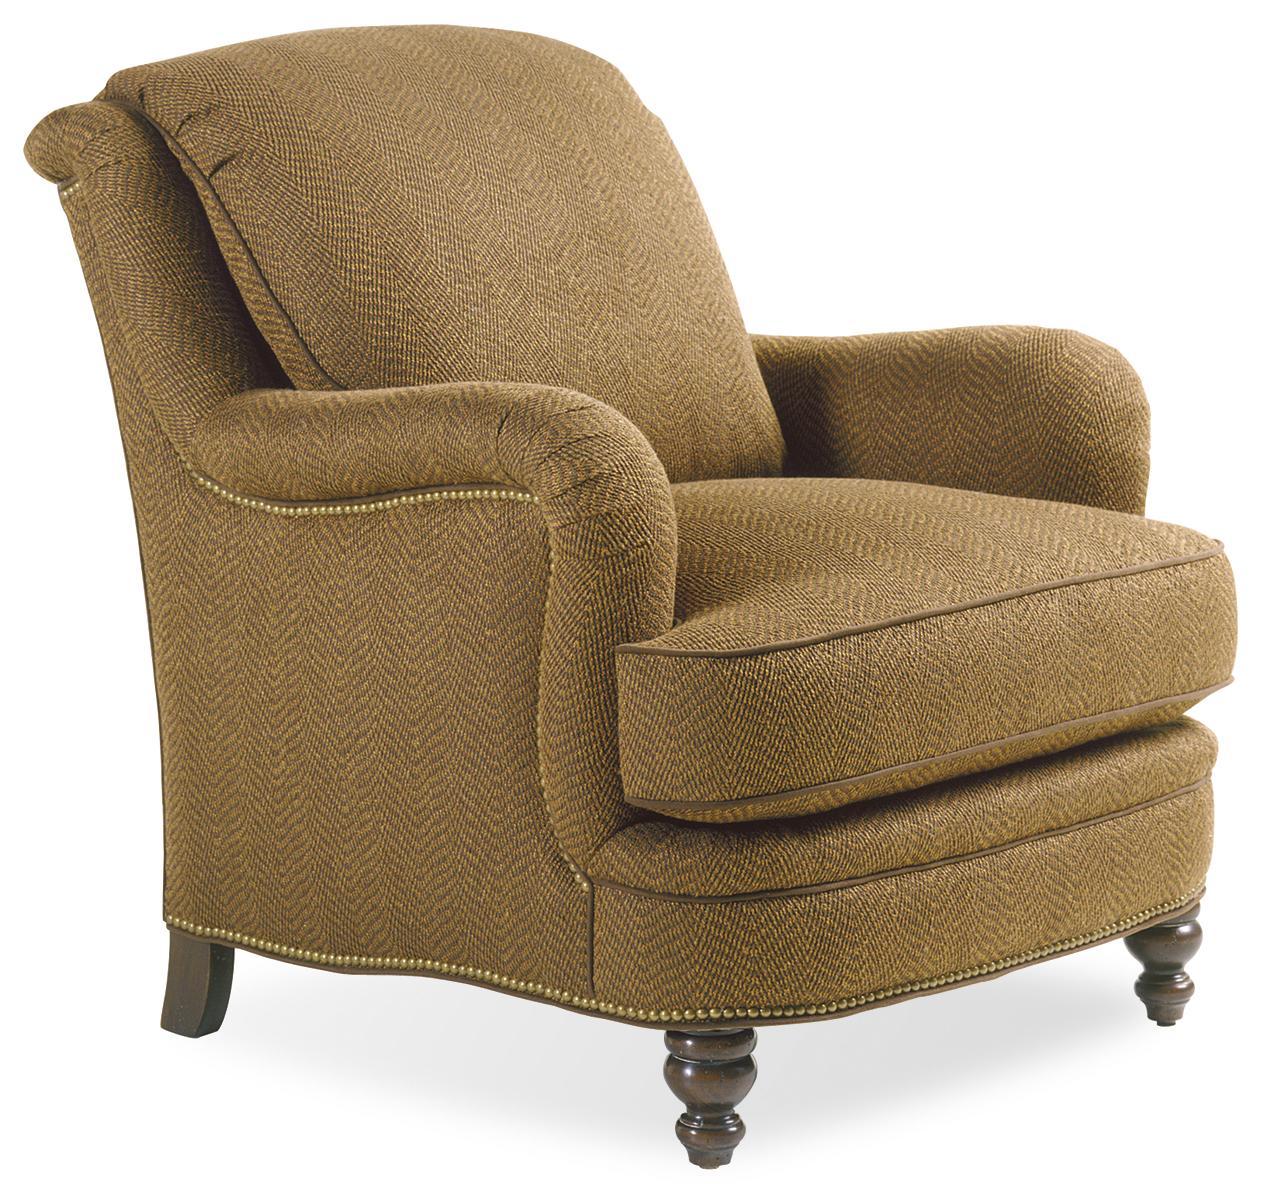 Placid Lounge Chair